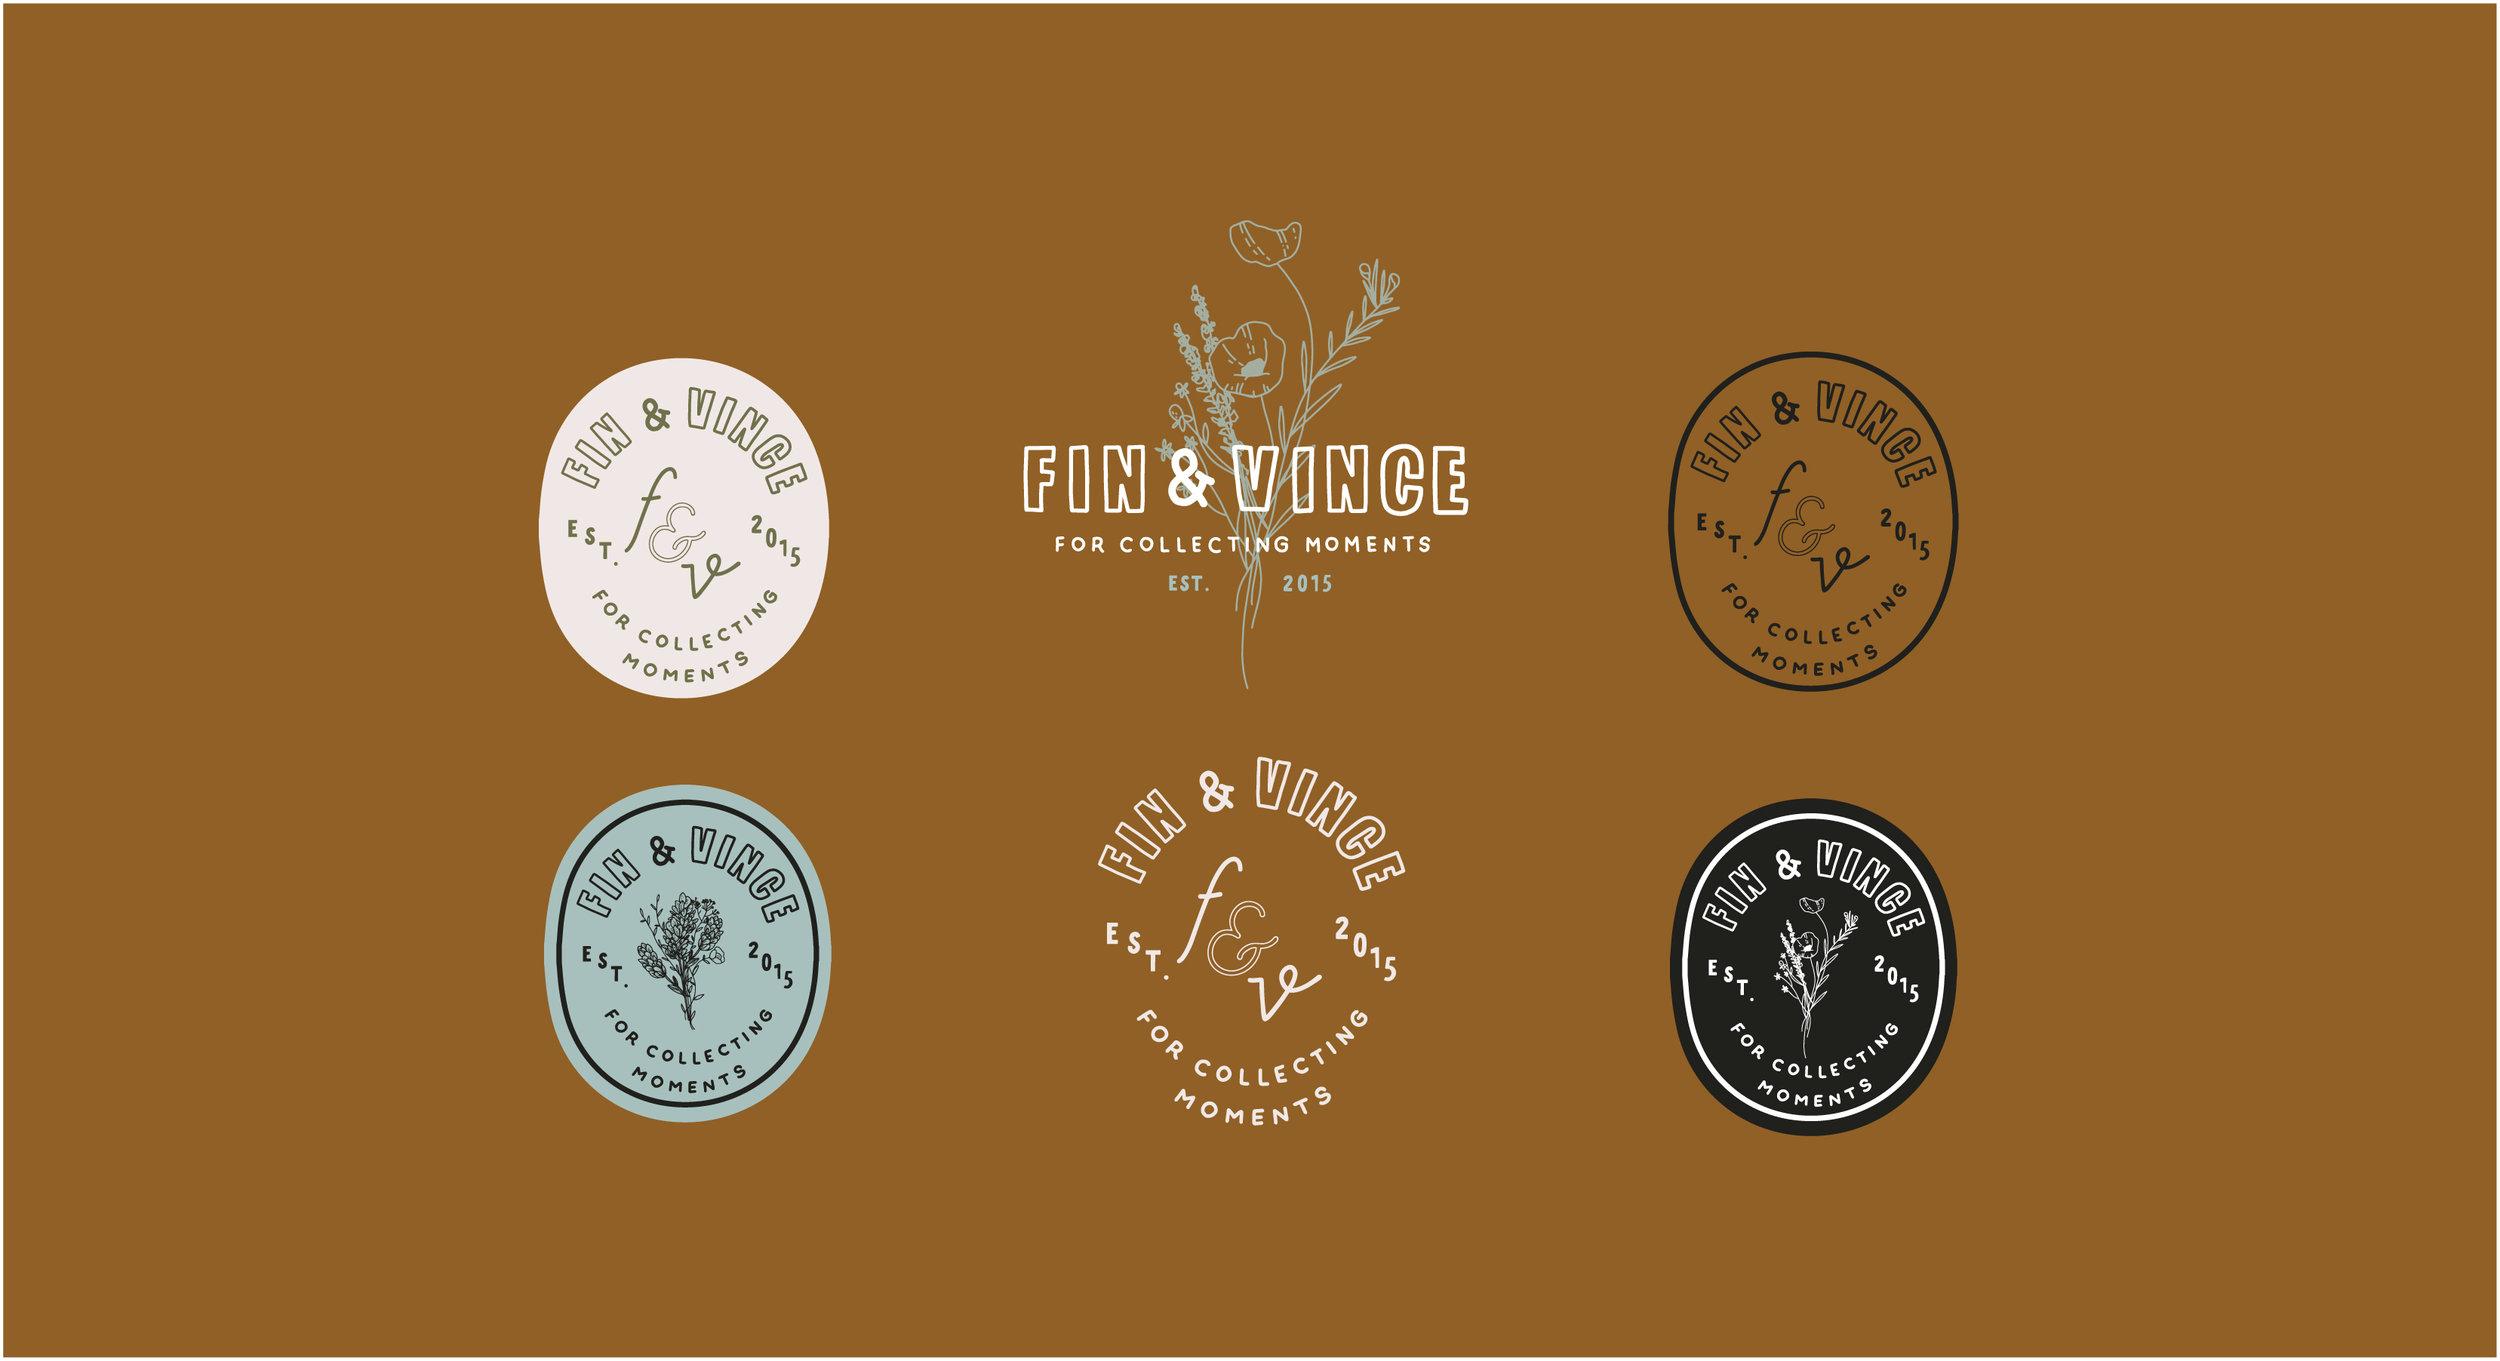 Fin & Vince Designs-2-02.jpg